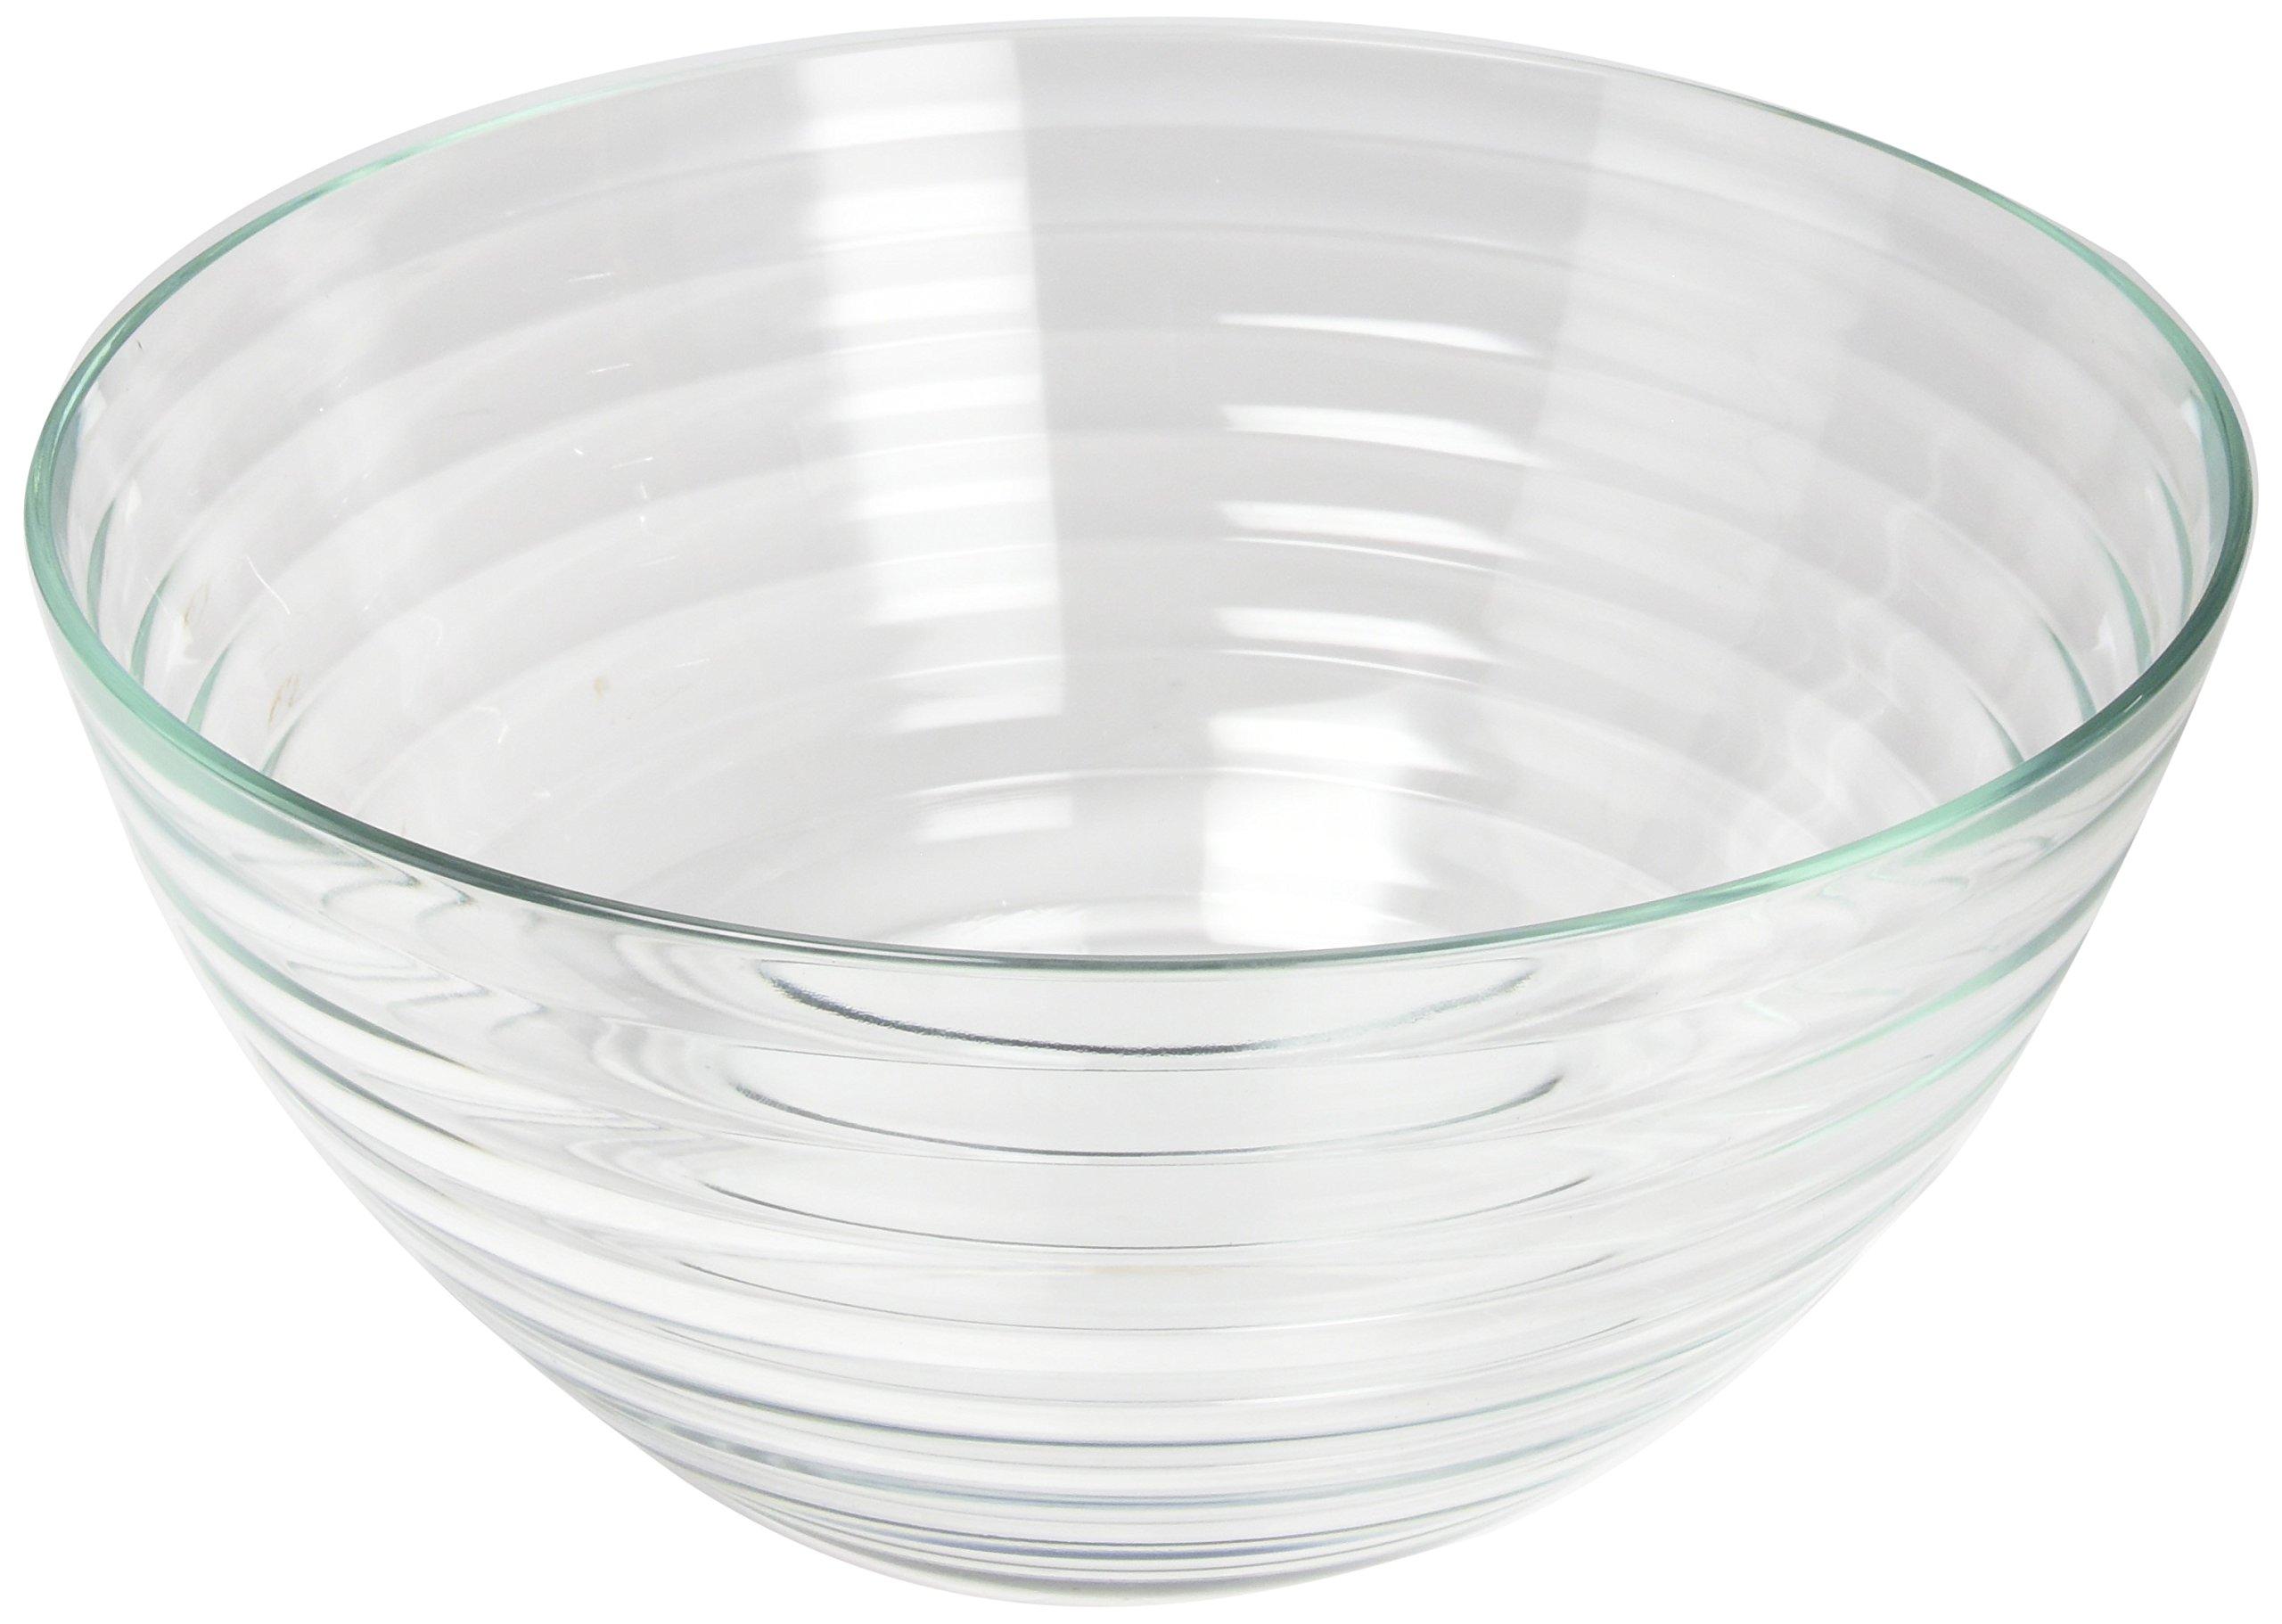 Rösle Salad Set with Glass Bowl & Stainless Steel Serving Utensils